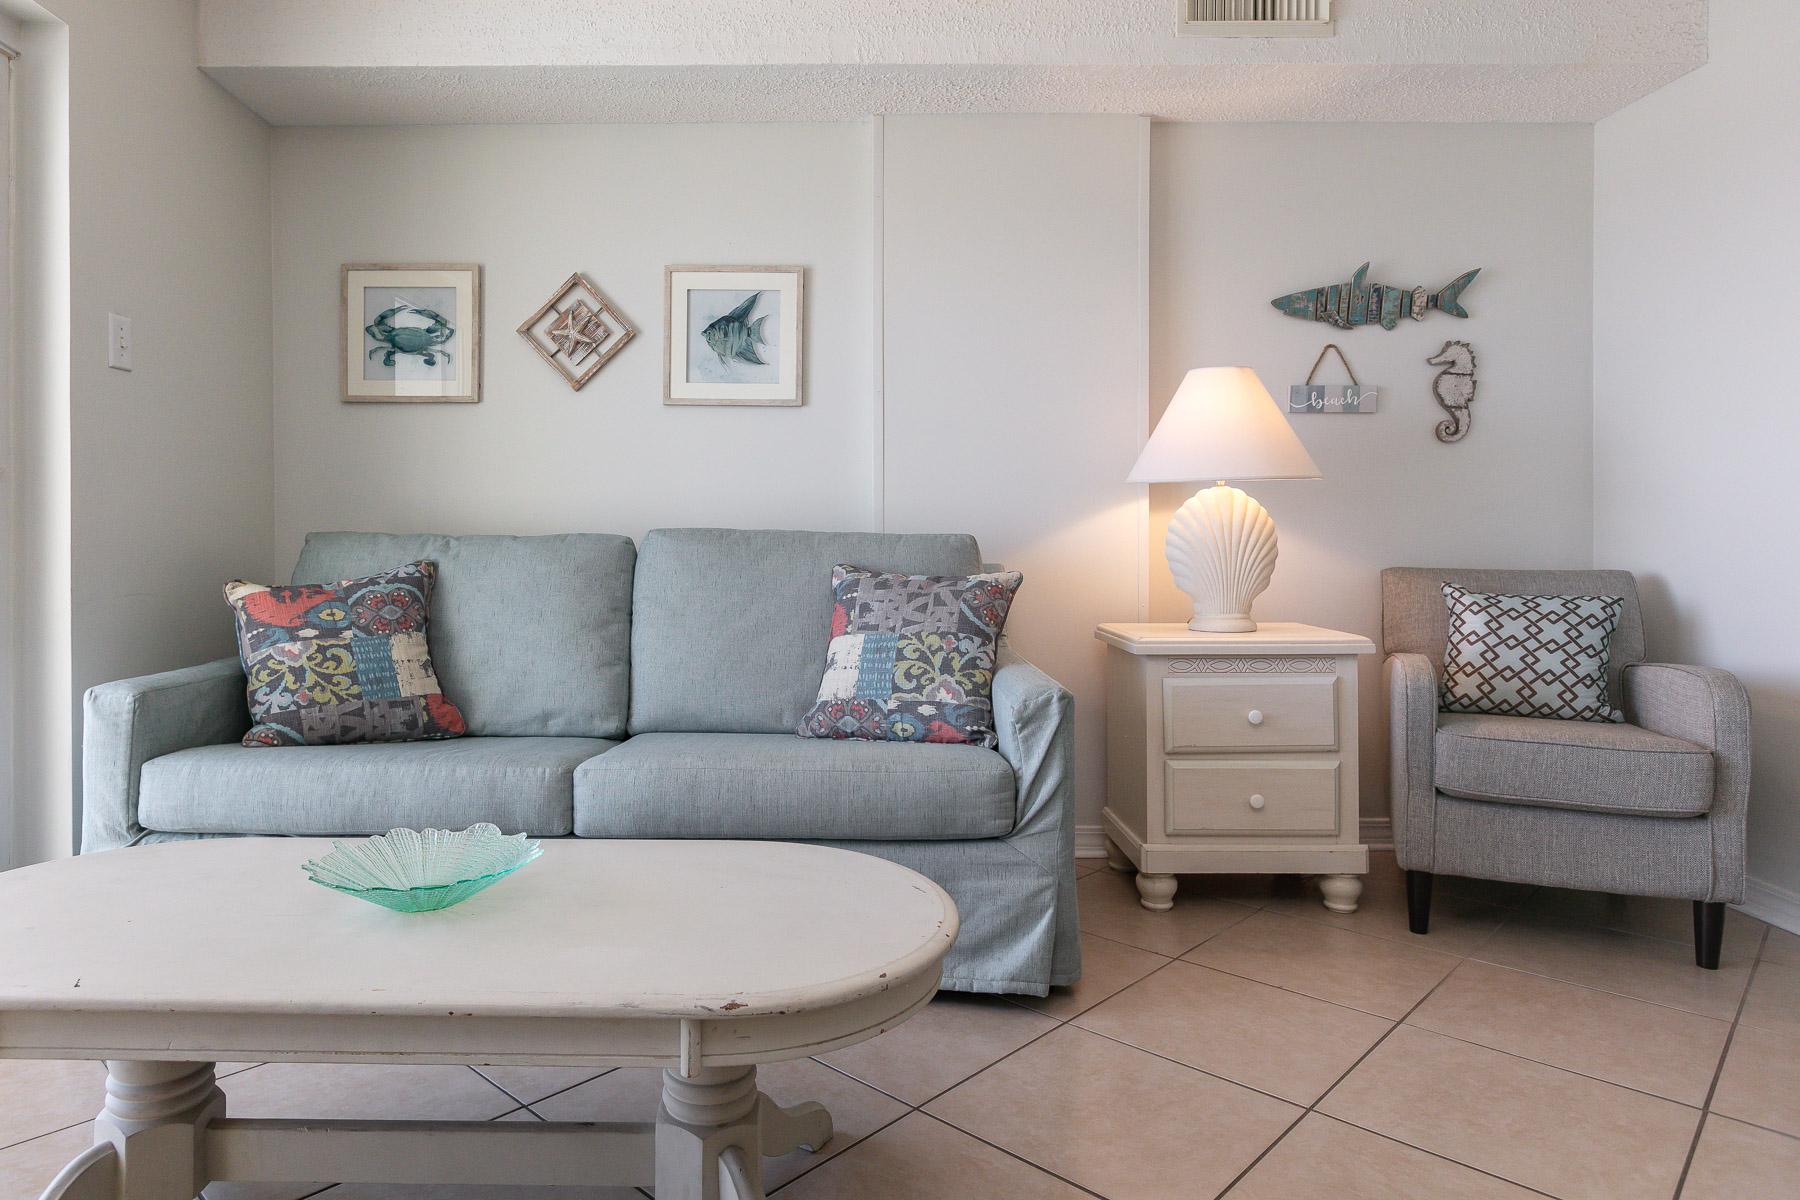 New Living Room Furniture with Sleeper Sofa